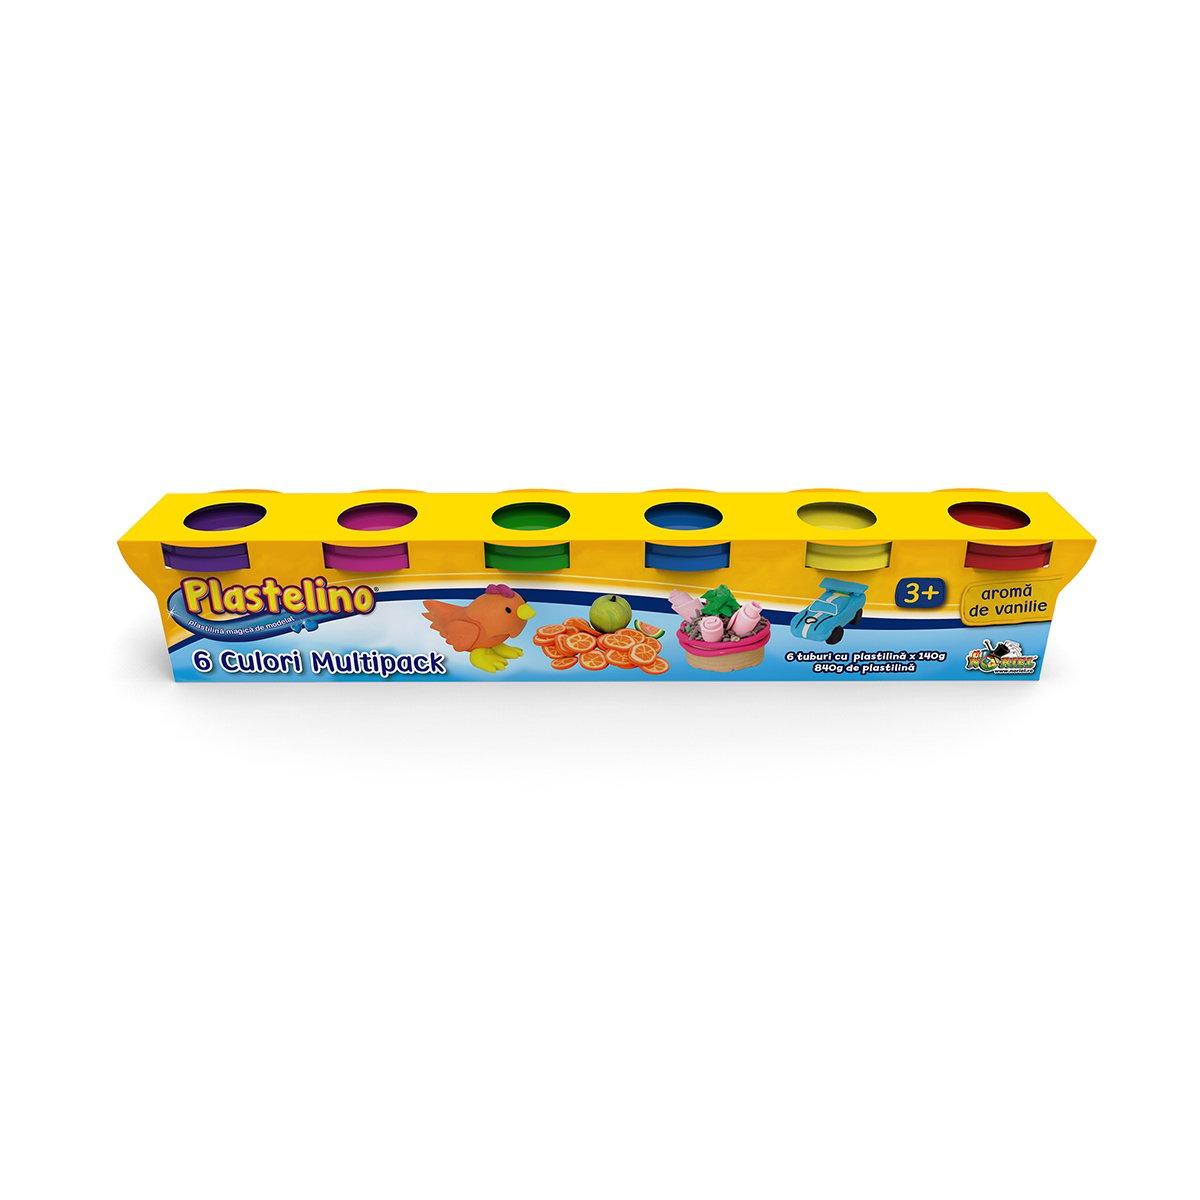 Plastelino - Multipack 6 culori II